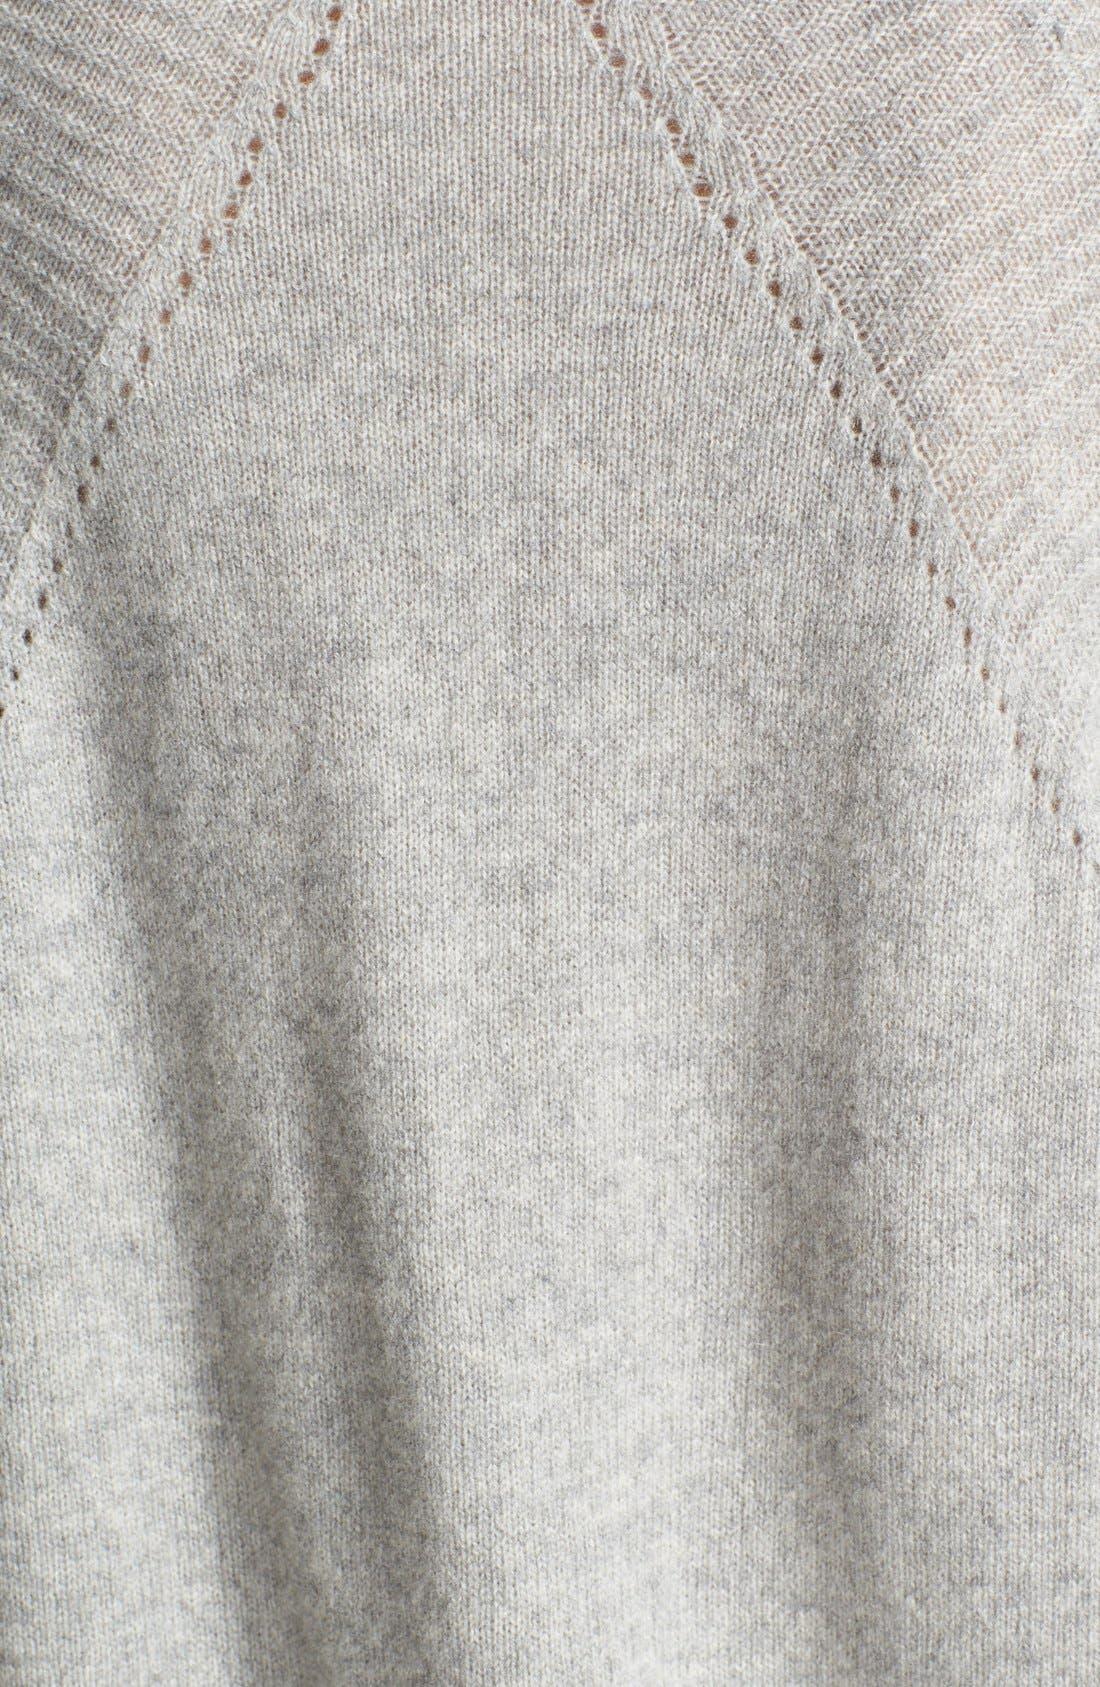 Alternate Image 3  - Belstaff Wool & Cashmere Turtleneck Sweater